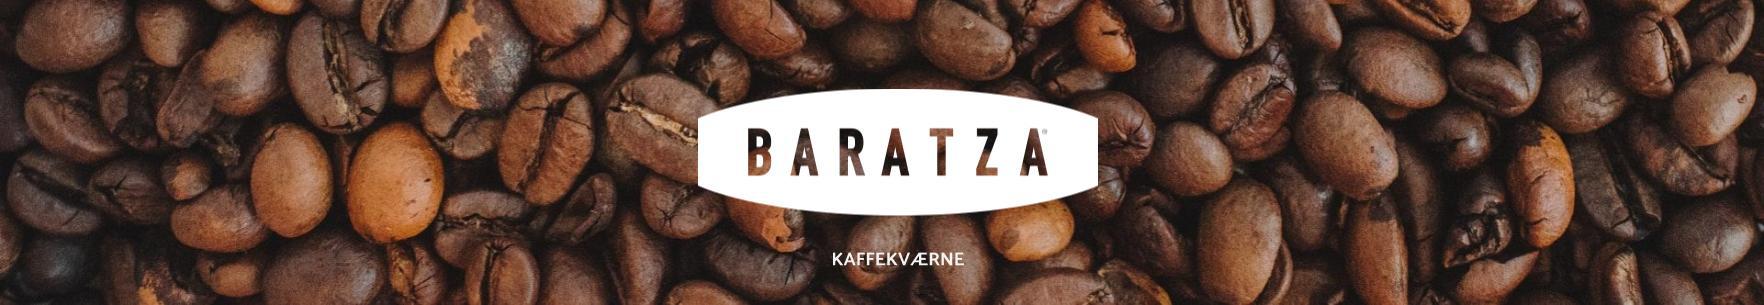 Baratza Kaffekværne